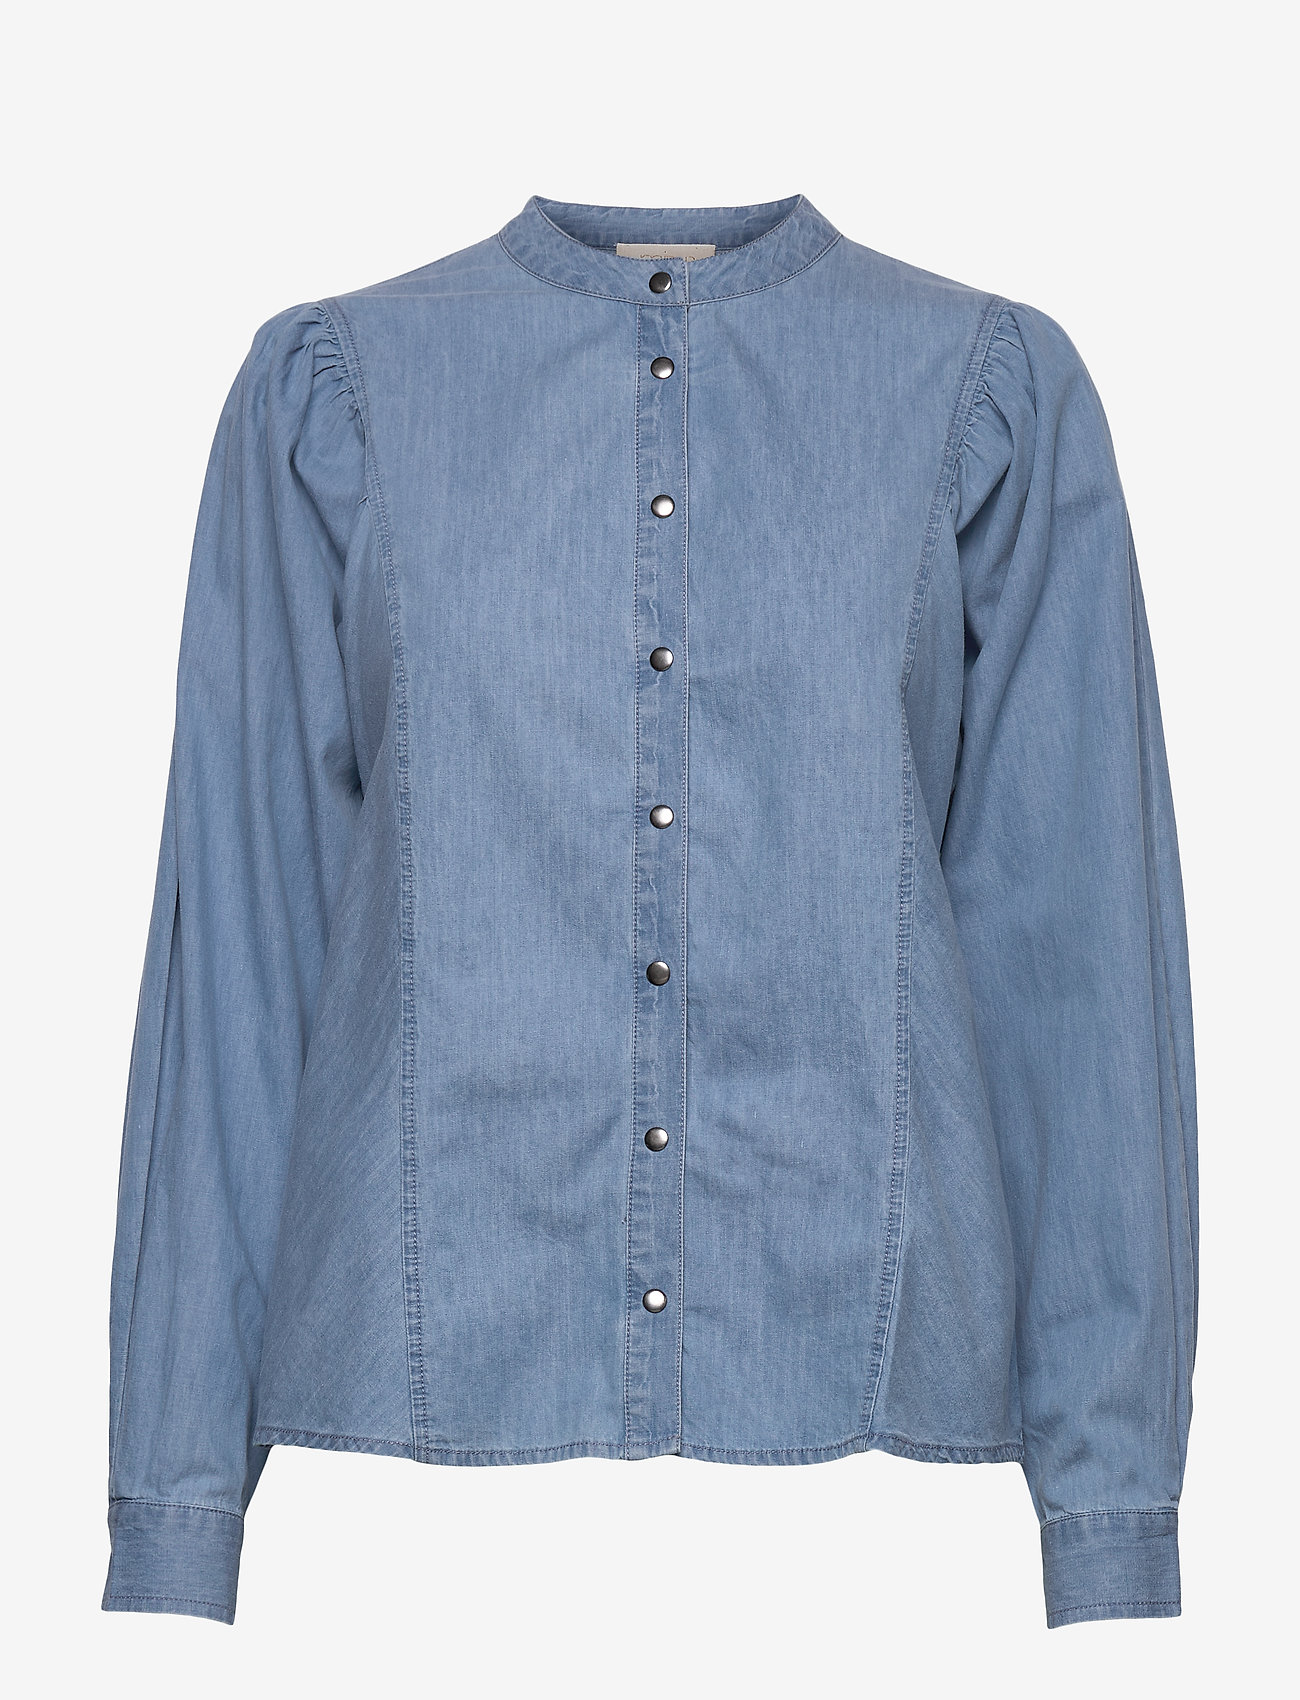 Minus - Camil shirt - jeansblouses - denim - 0